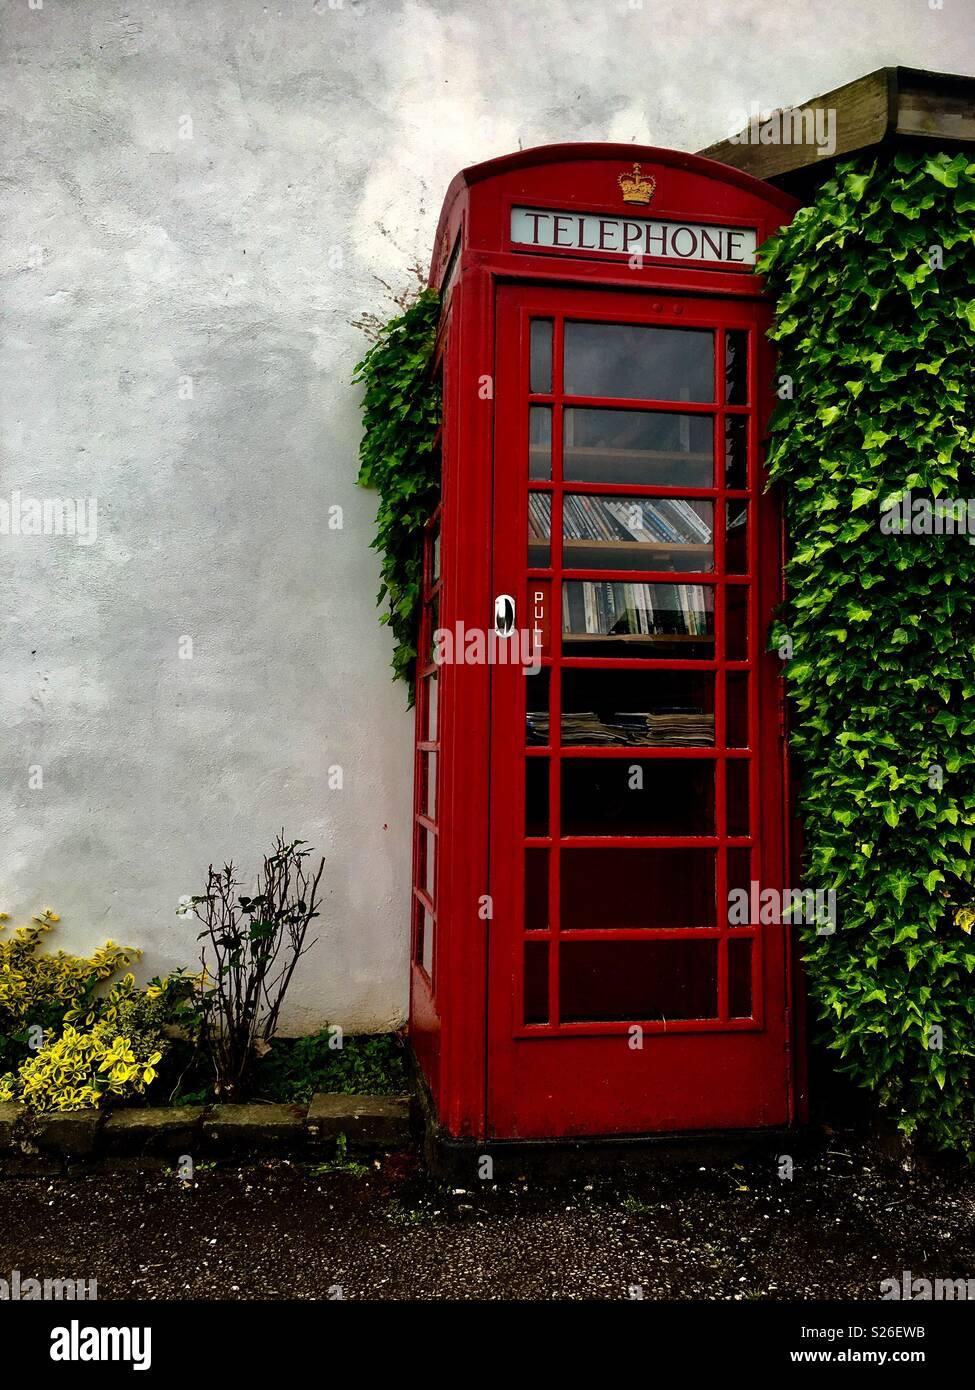 Phone Booth Lake District Inglaterra Imagen De Stock